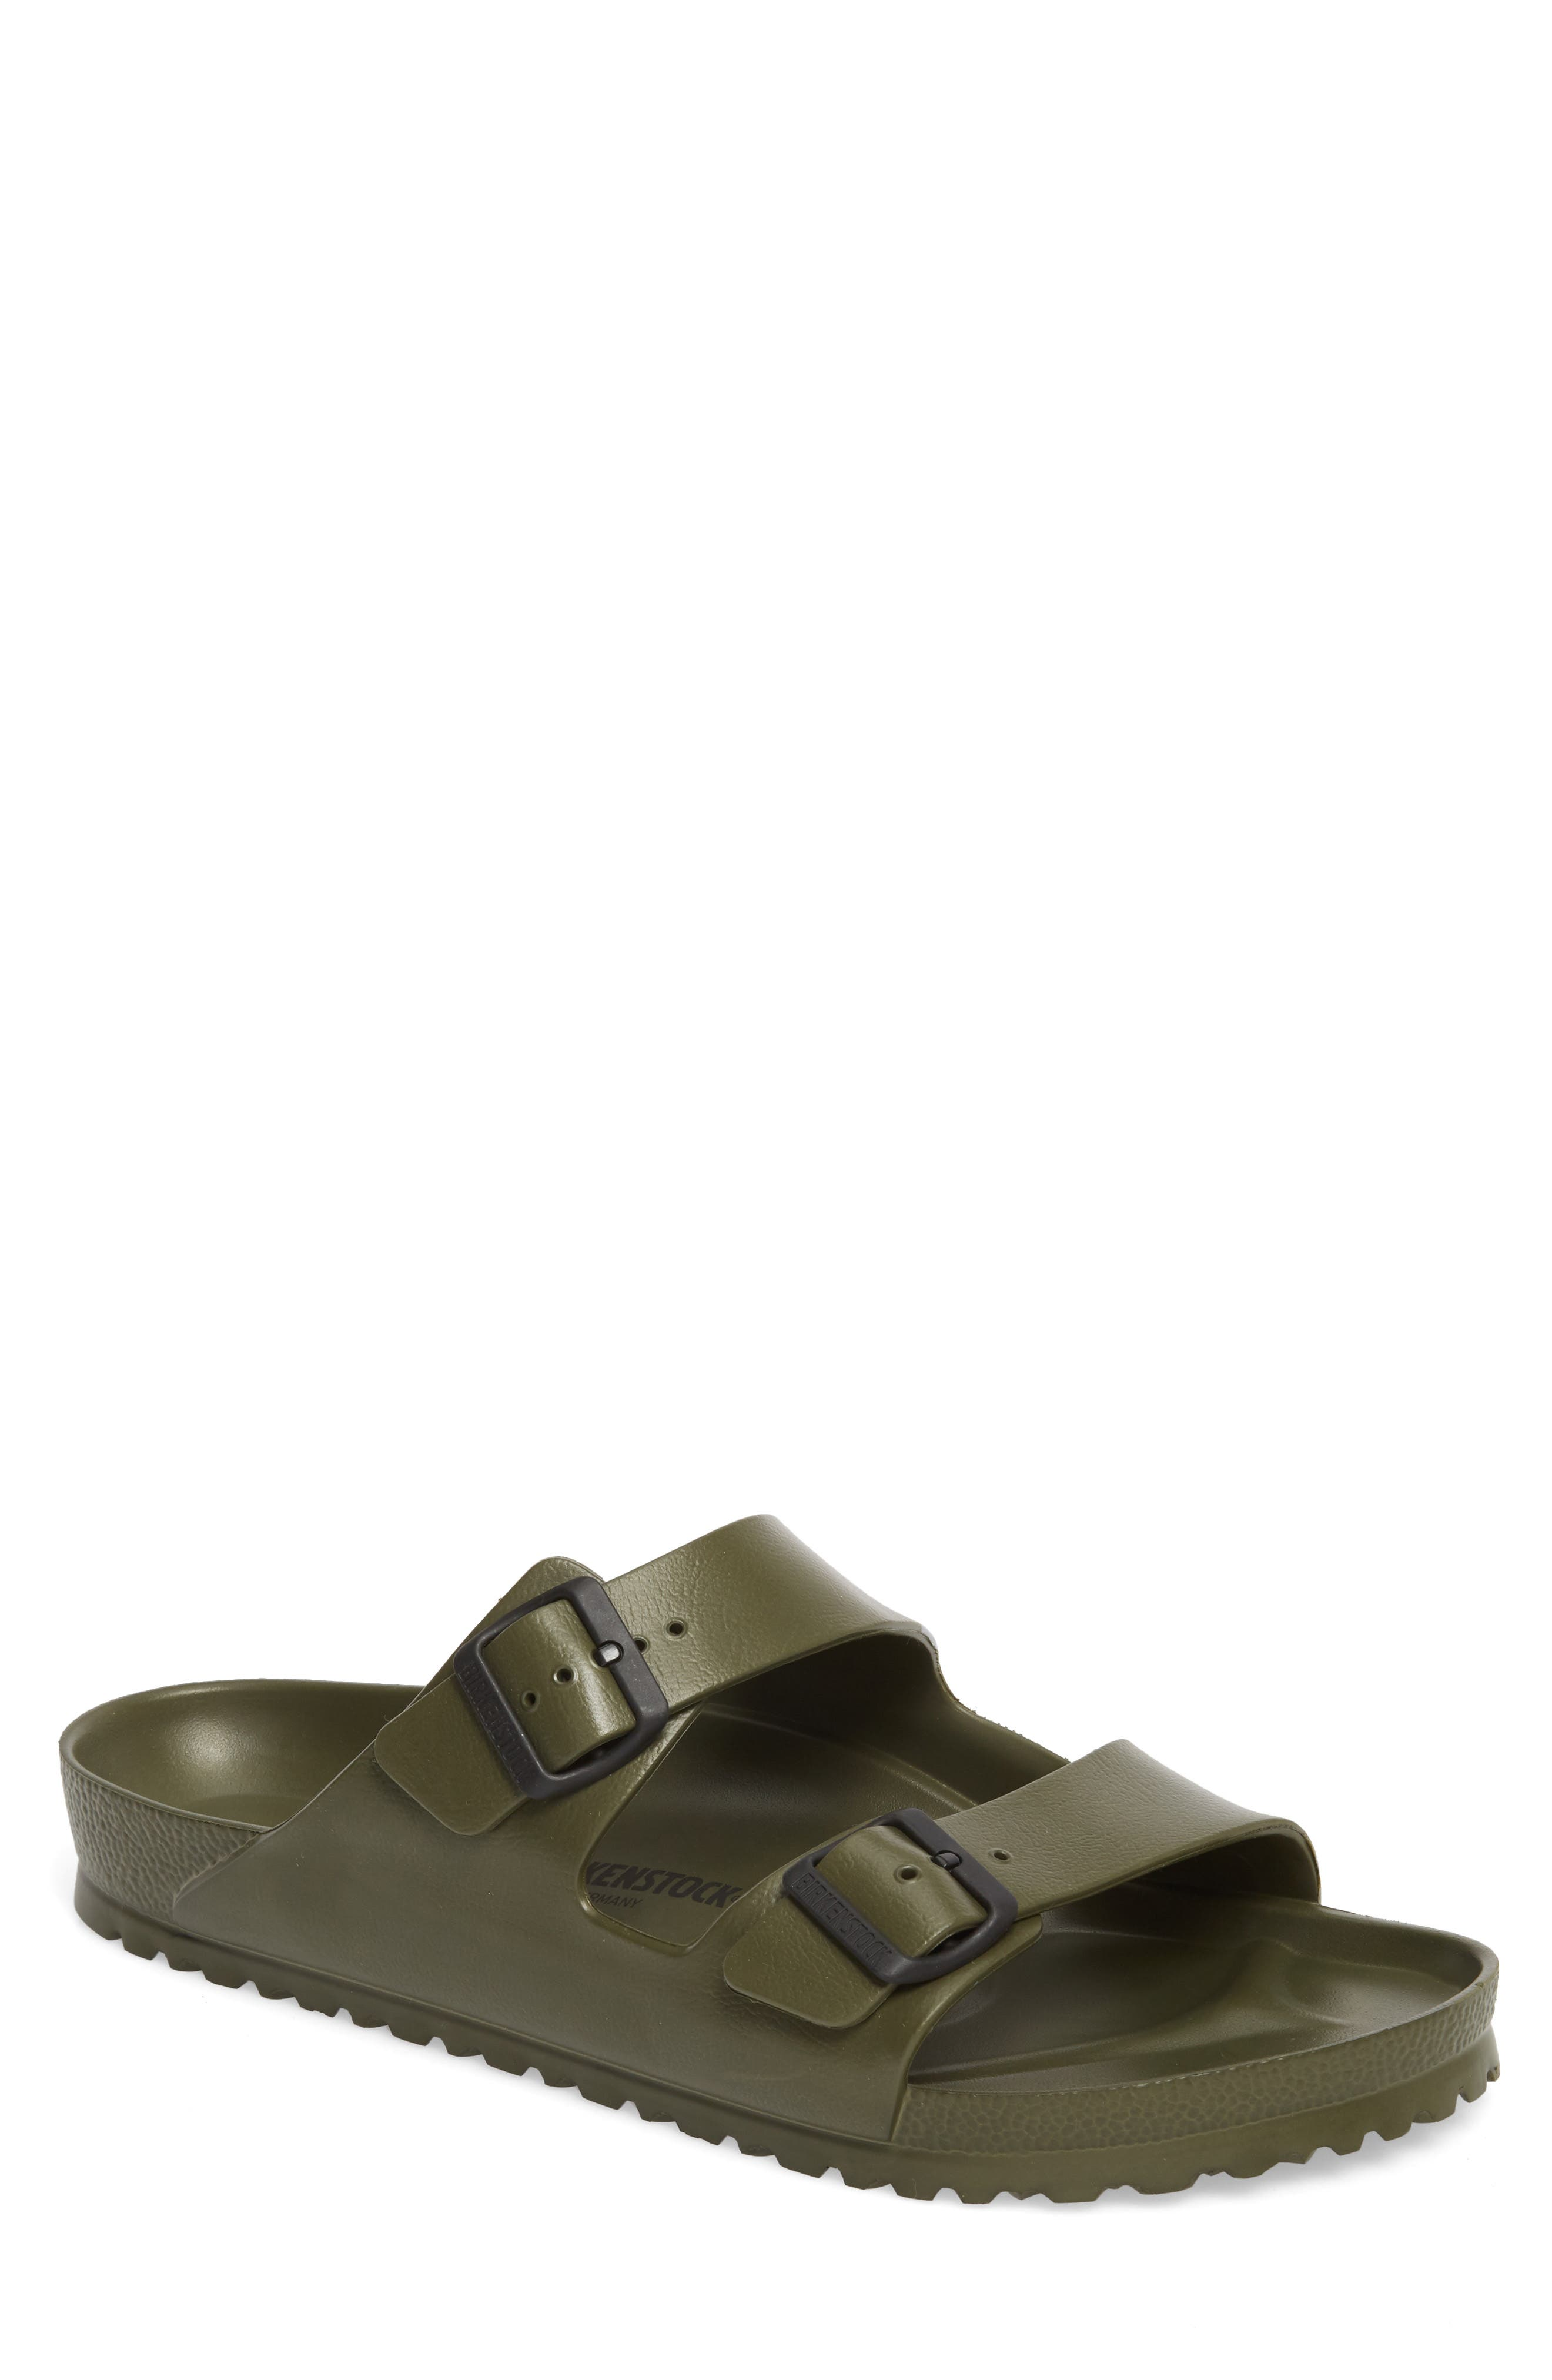 'Essentials - Arizona EVA' Waterproof Slide Sandal,                         Main,                         color, GREEN